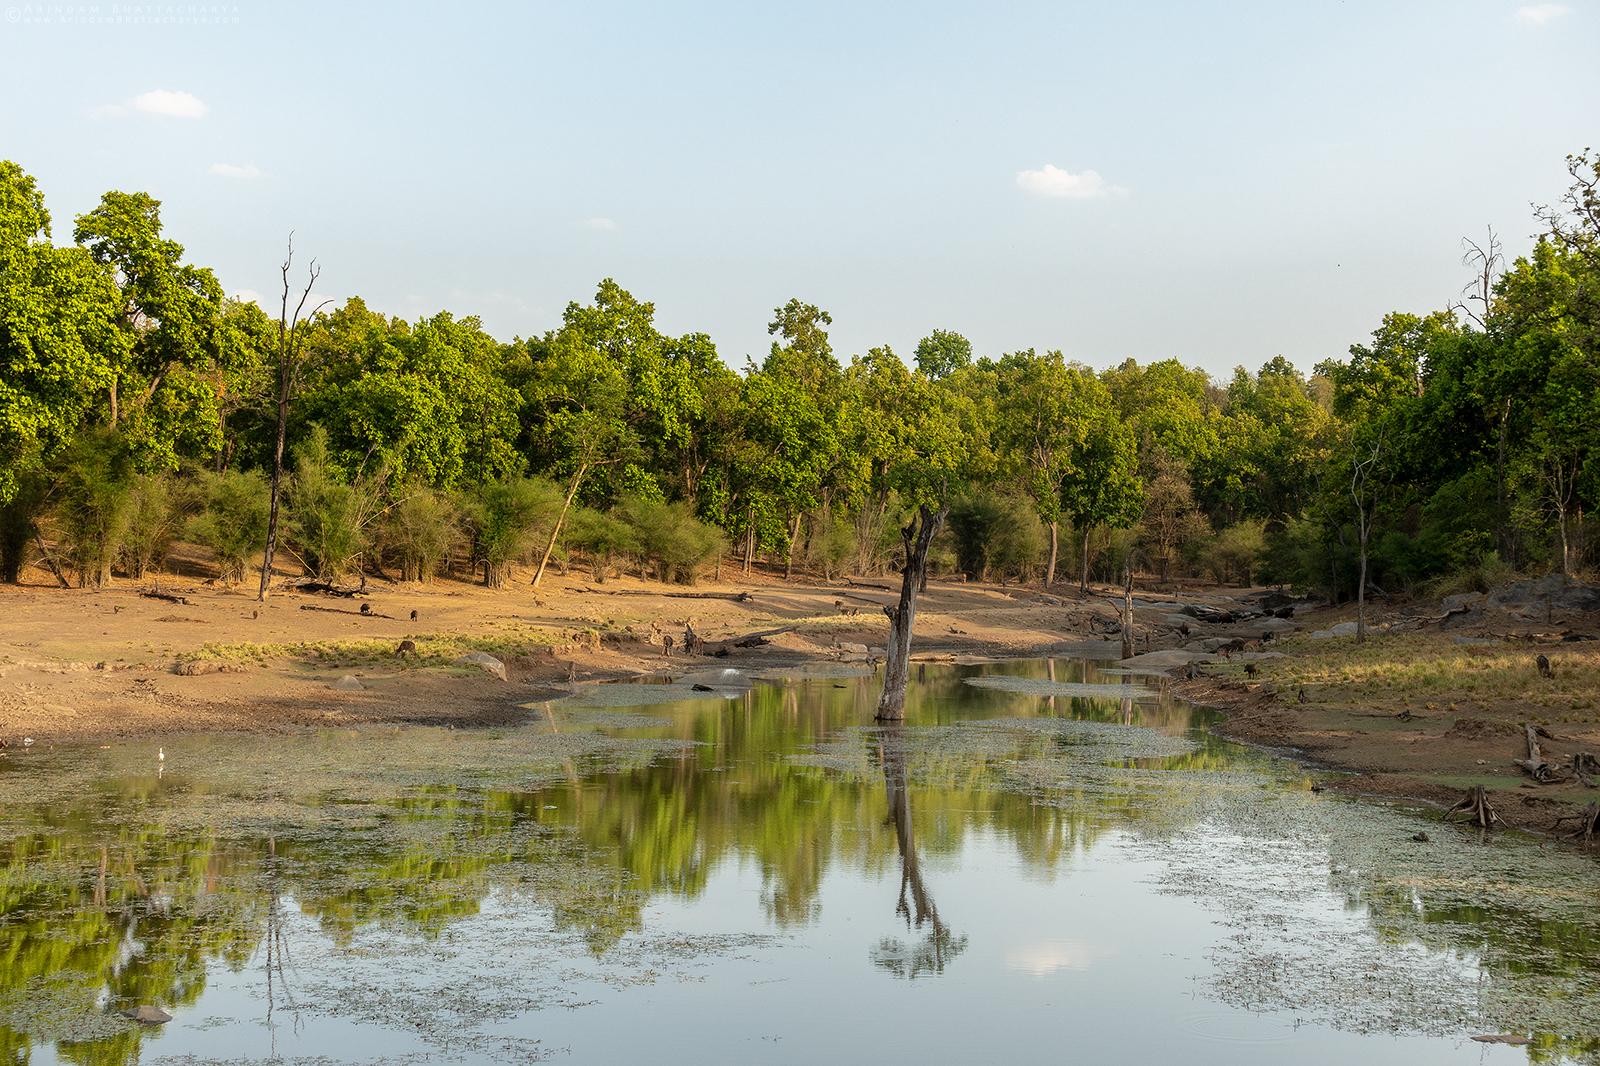 Landscape of Kanha National Park, India's premier tiger reserve in Madhya Pradesh